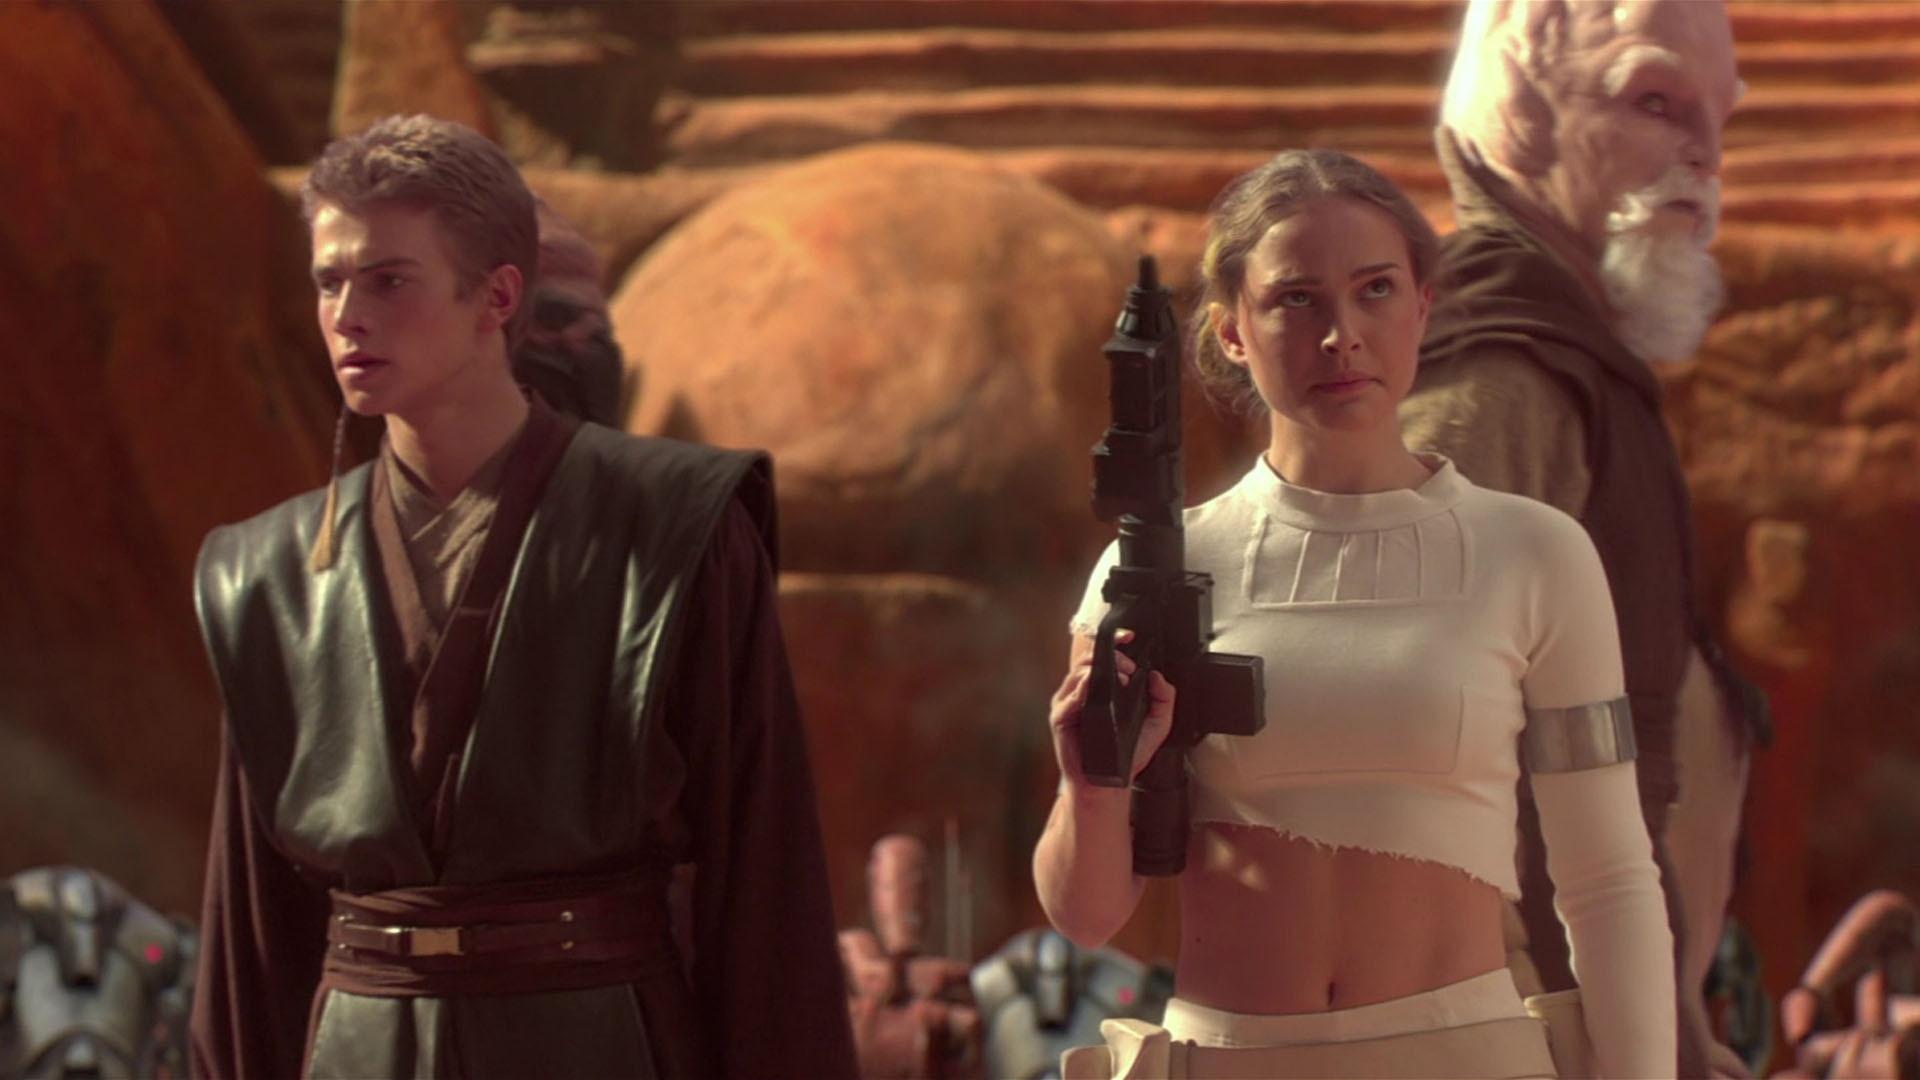 Anakin Skywalker Padme Amidala Hayden Christensen Natalie Portman Wallpaper Resolution 1920x1080 Id 736091 Wallha Com